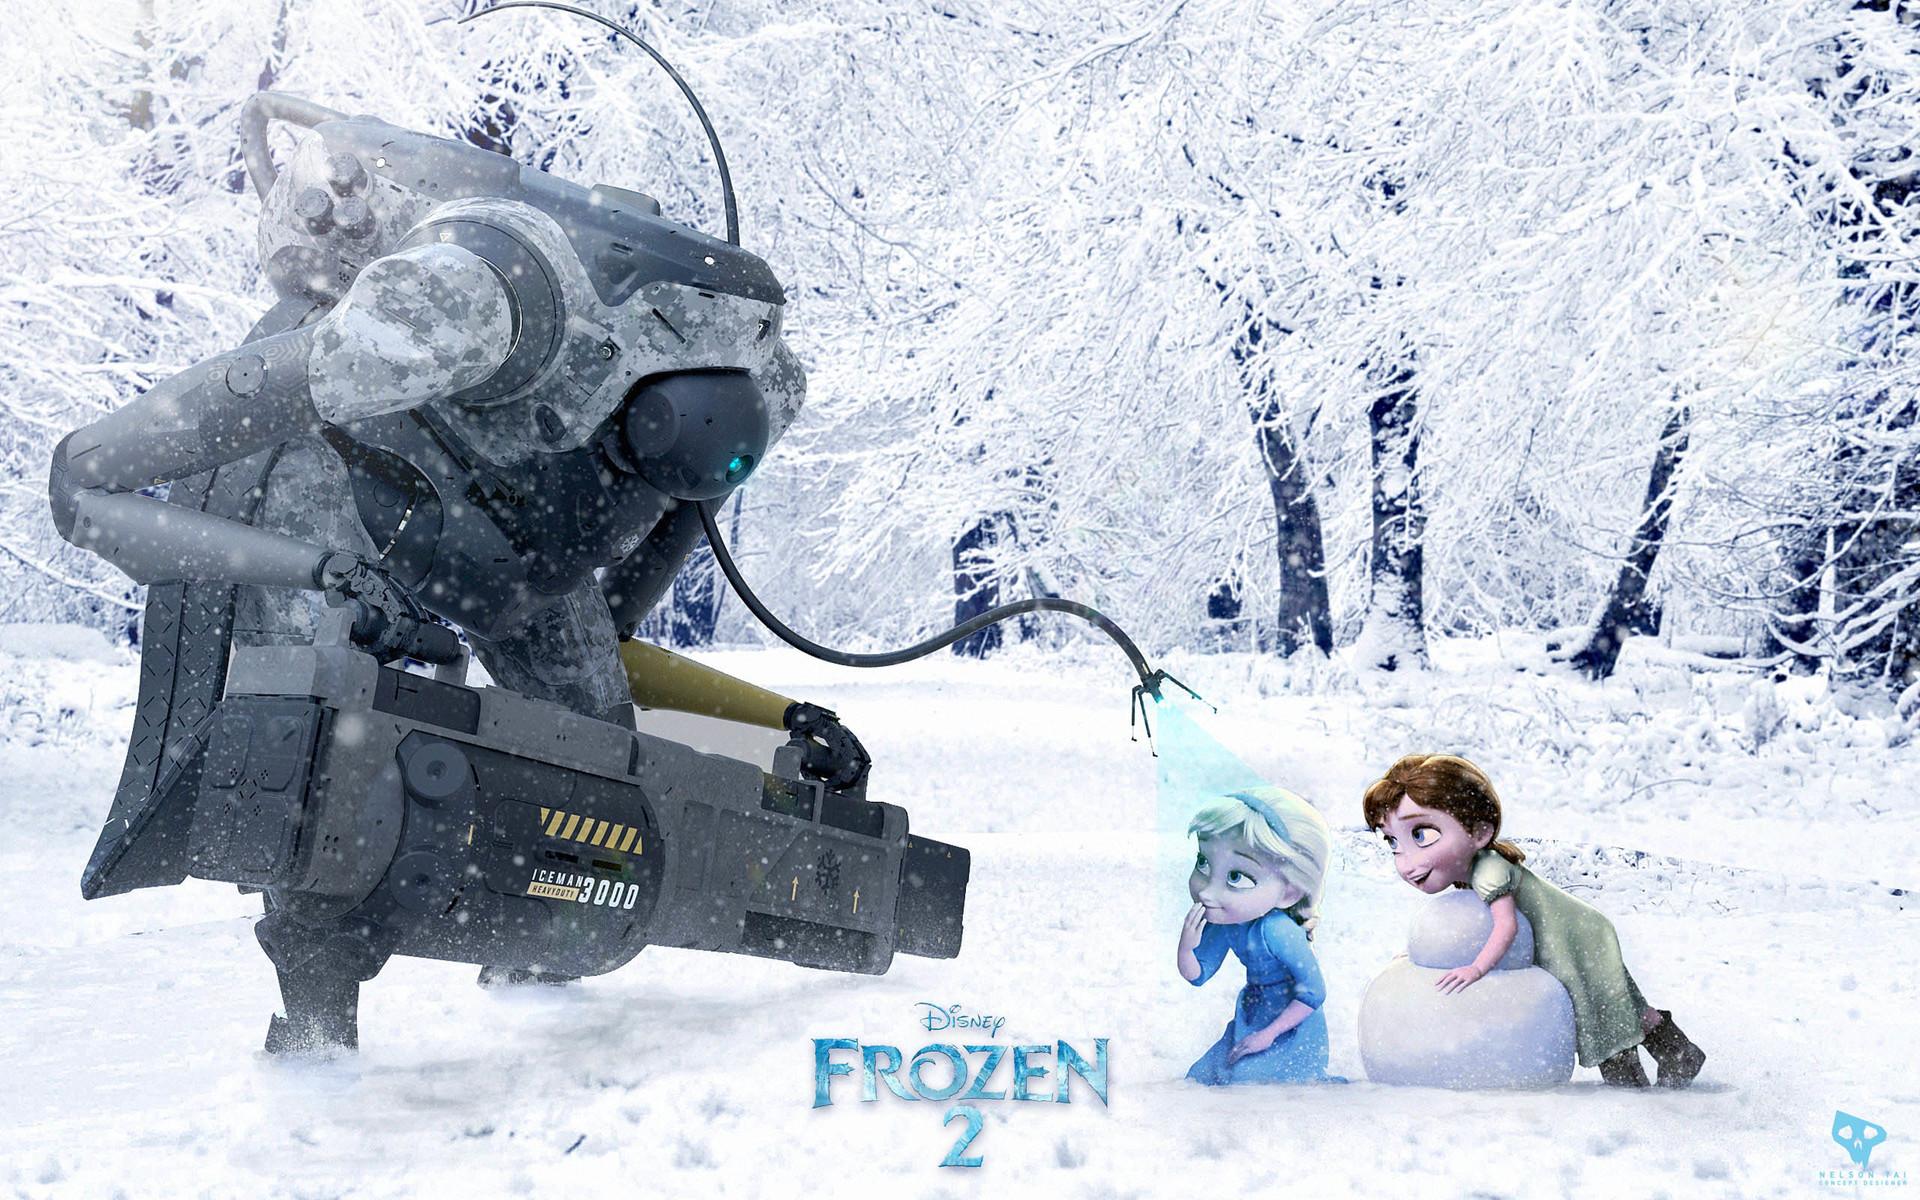 Nelson tai iceman dsgn i 001a